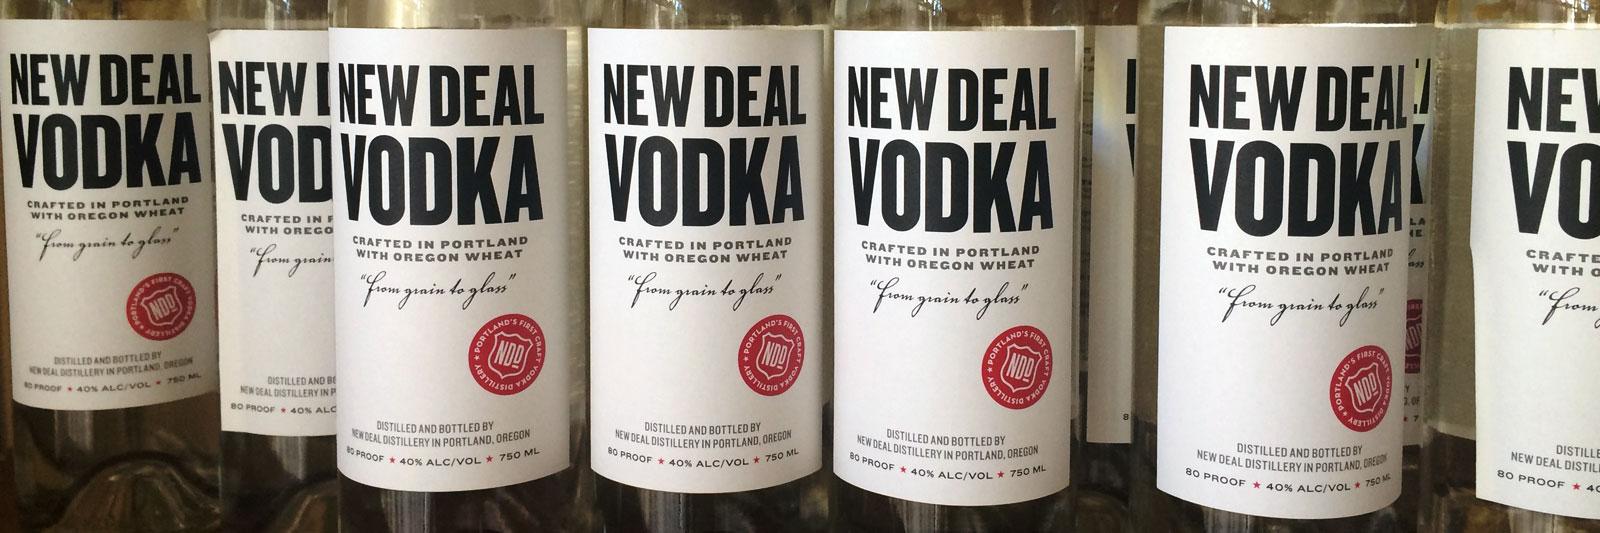 new_deal_vodka_banner_2